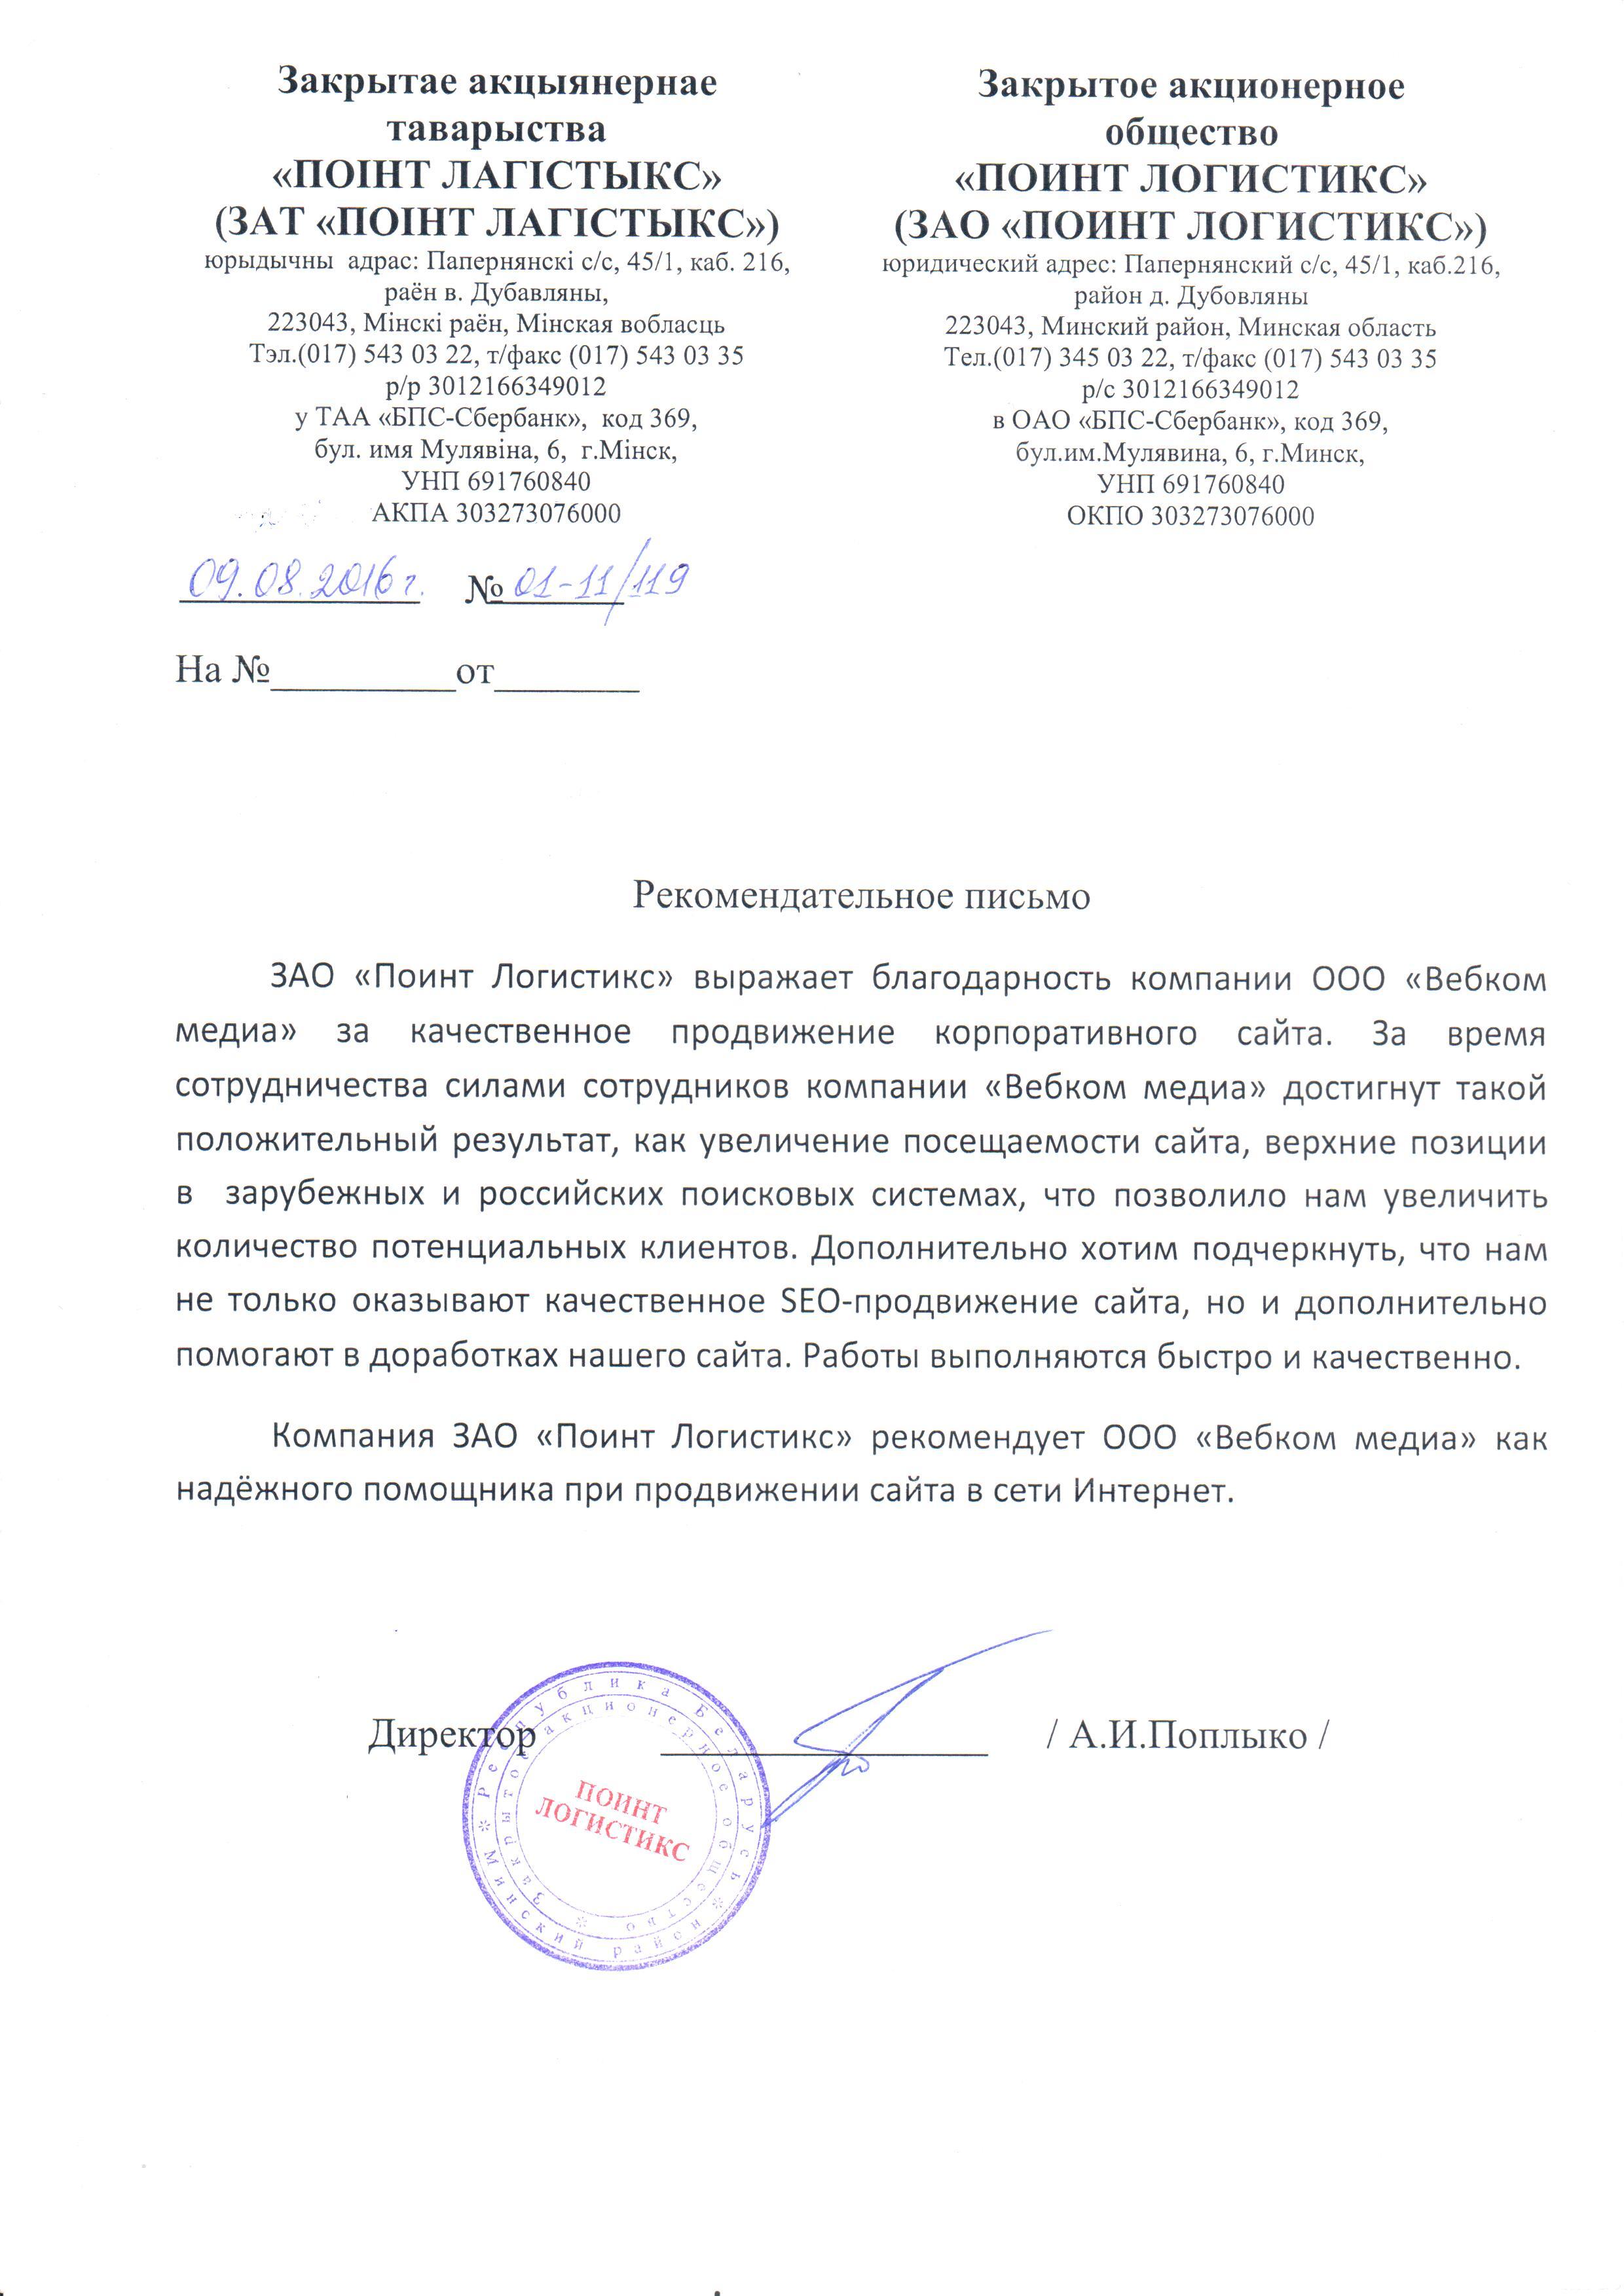 Директор ЗАО «Поинт Логистике»